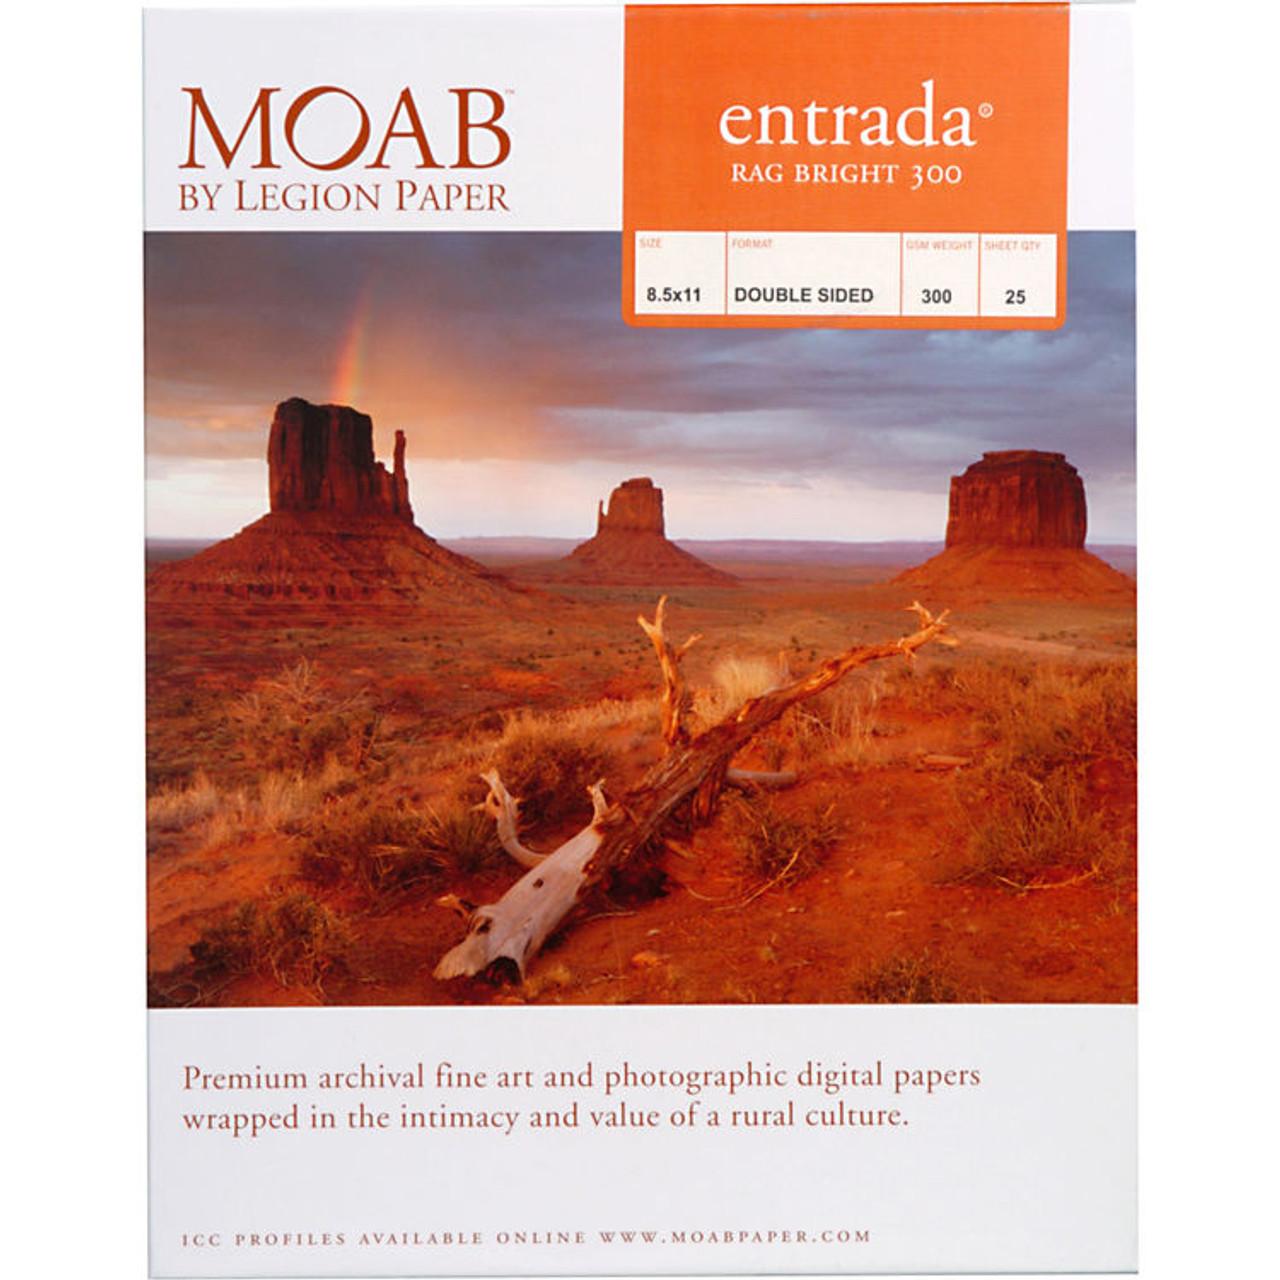 MOAB ENTRADA RAG BRIGHT 300